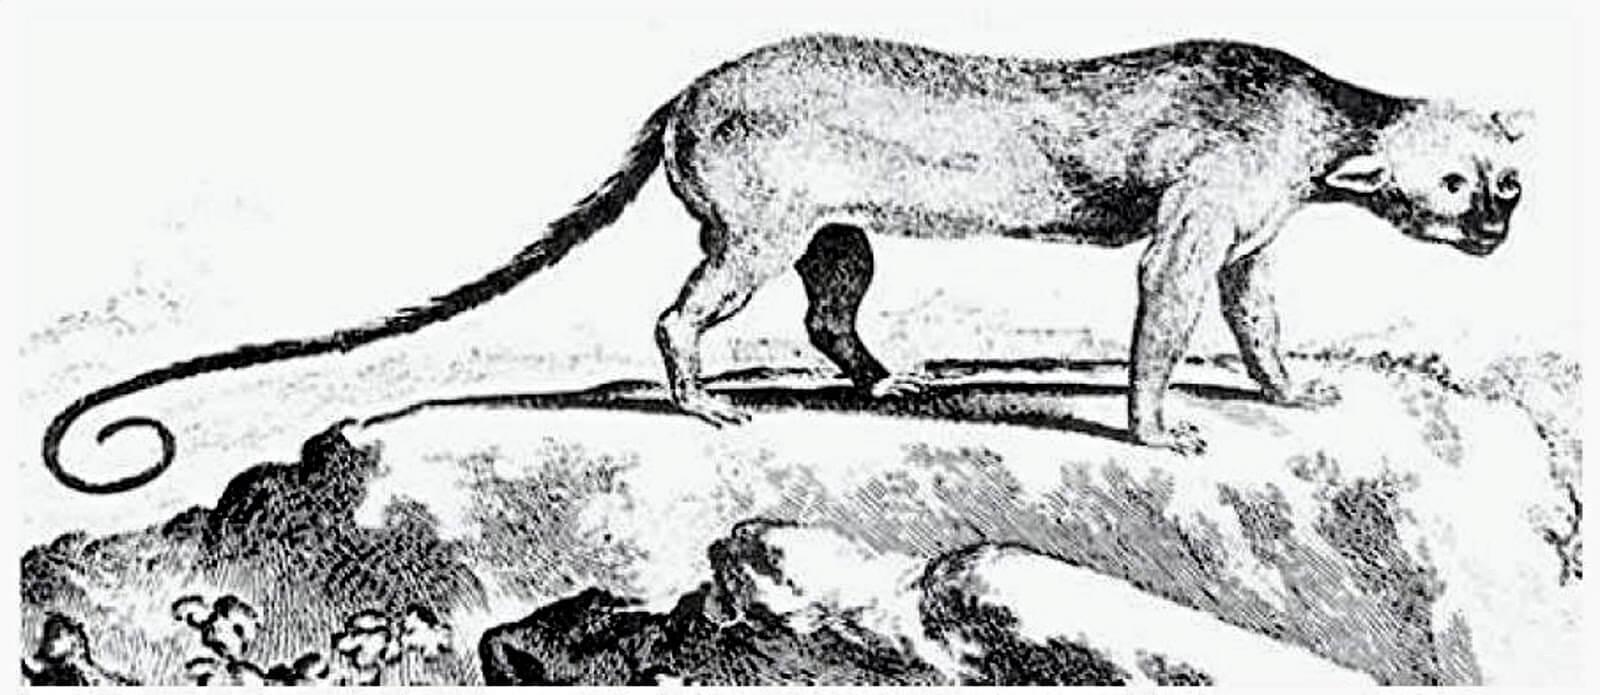 11-16-2018 Poto, mystery Jamaican mammal, possibly Xenothrix